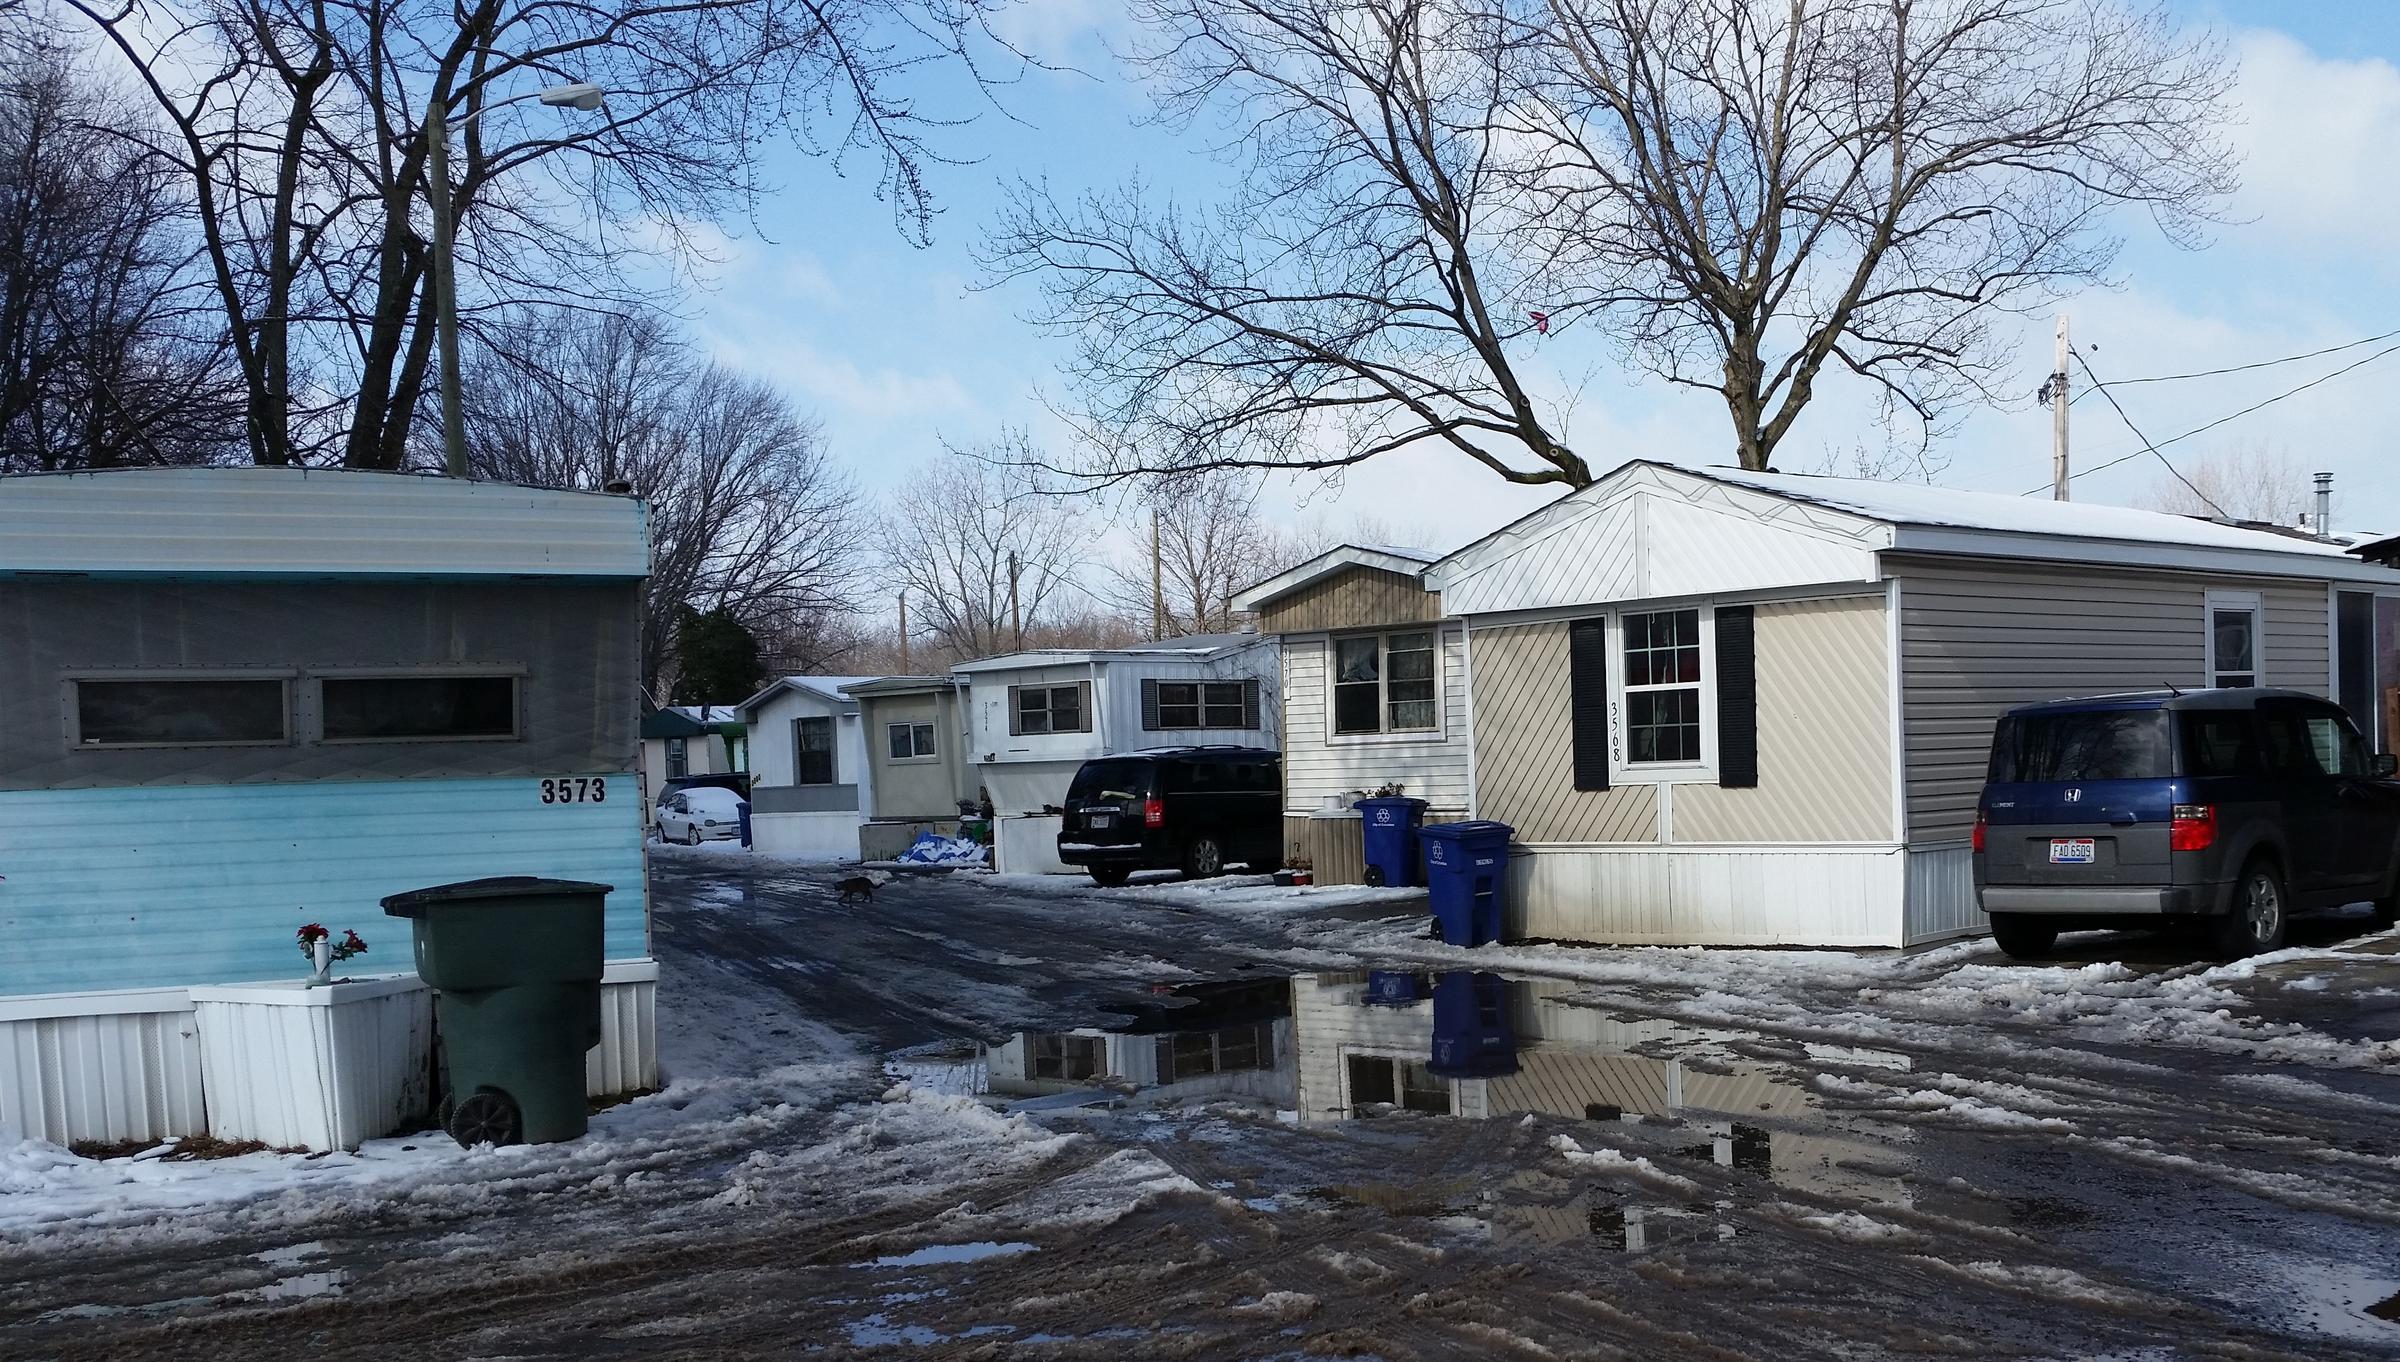 Advocates Of Manufactured Homes Urge Ohio Senate To Keep Oversight